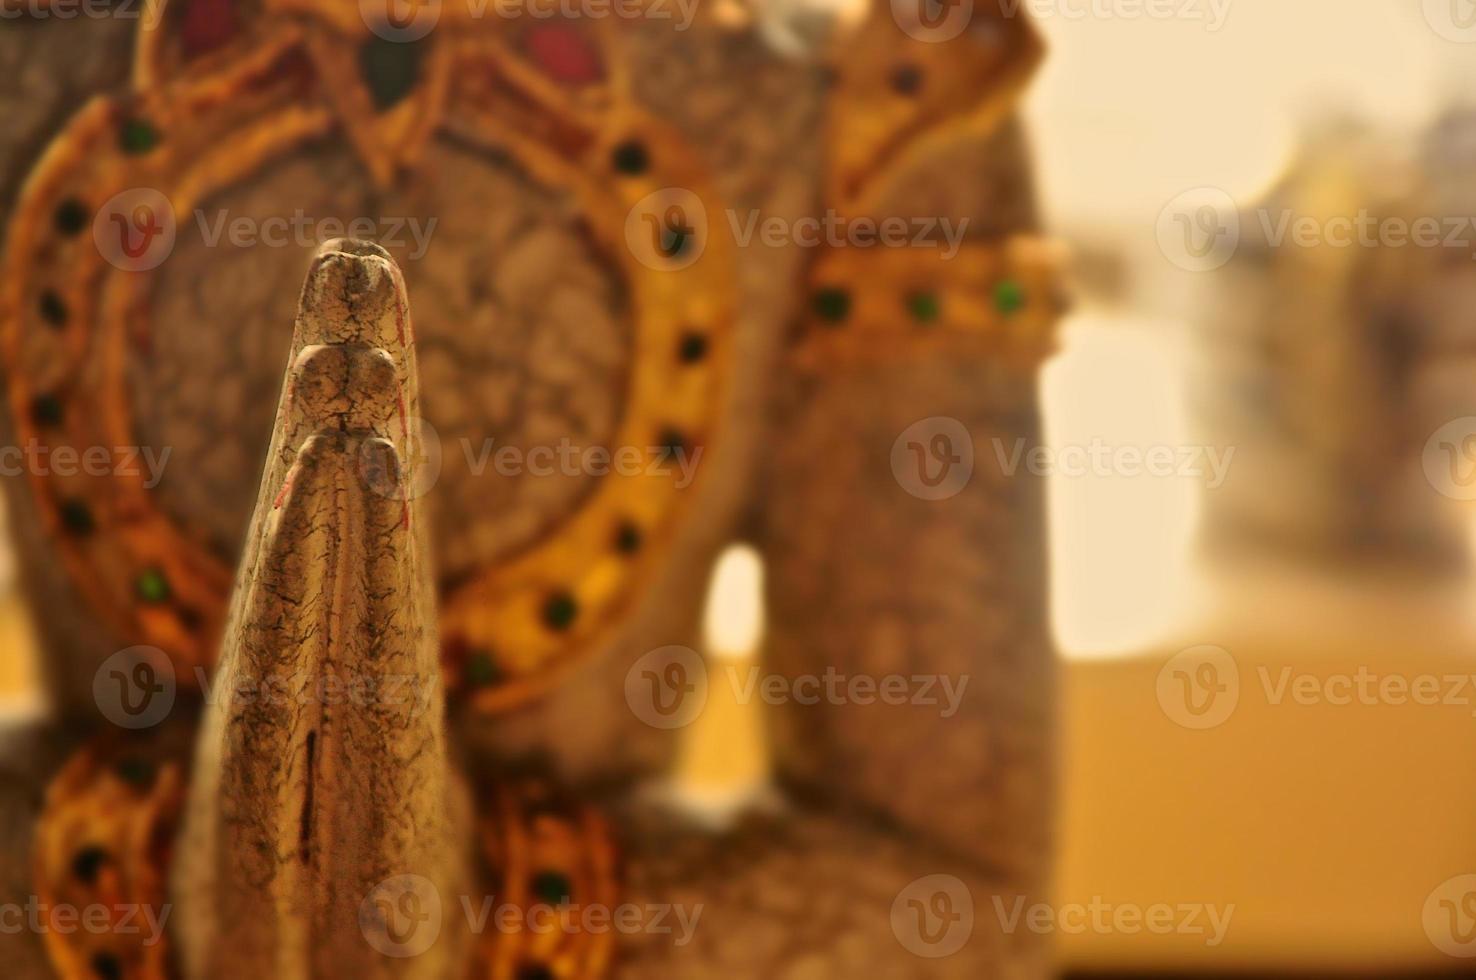 Buddha Hand close-up photo